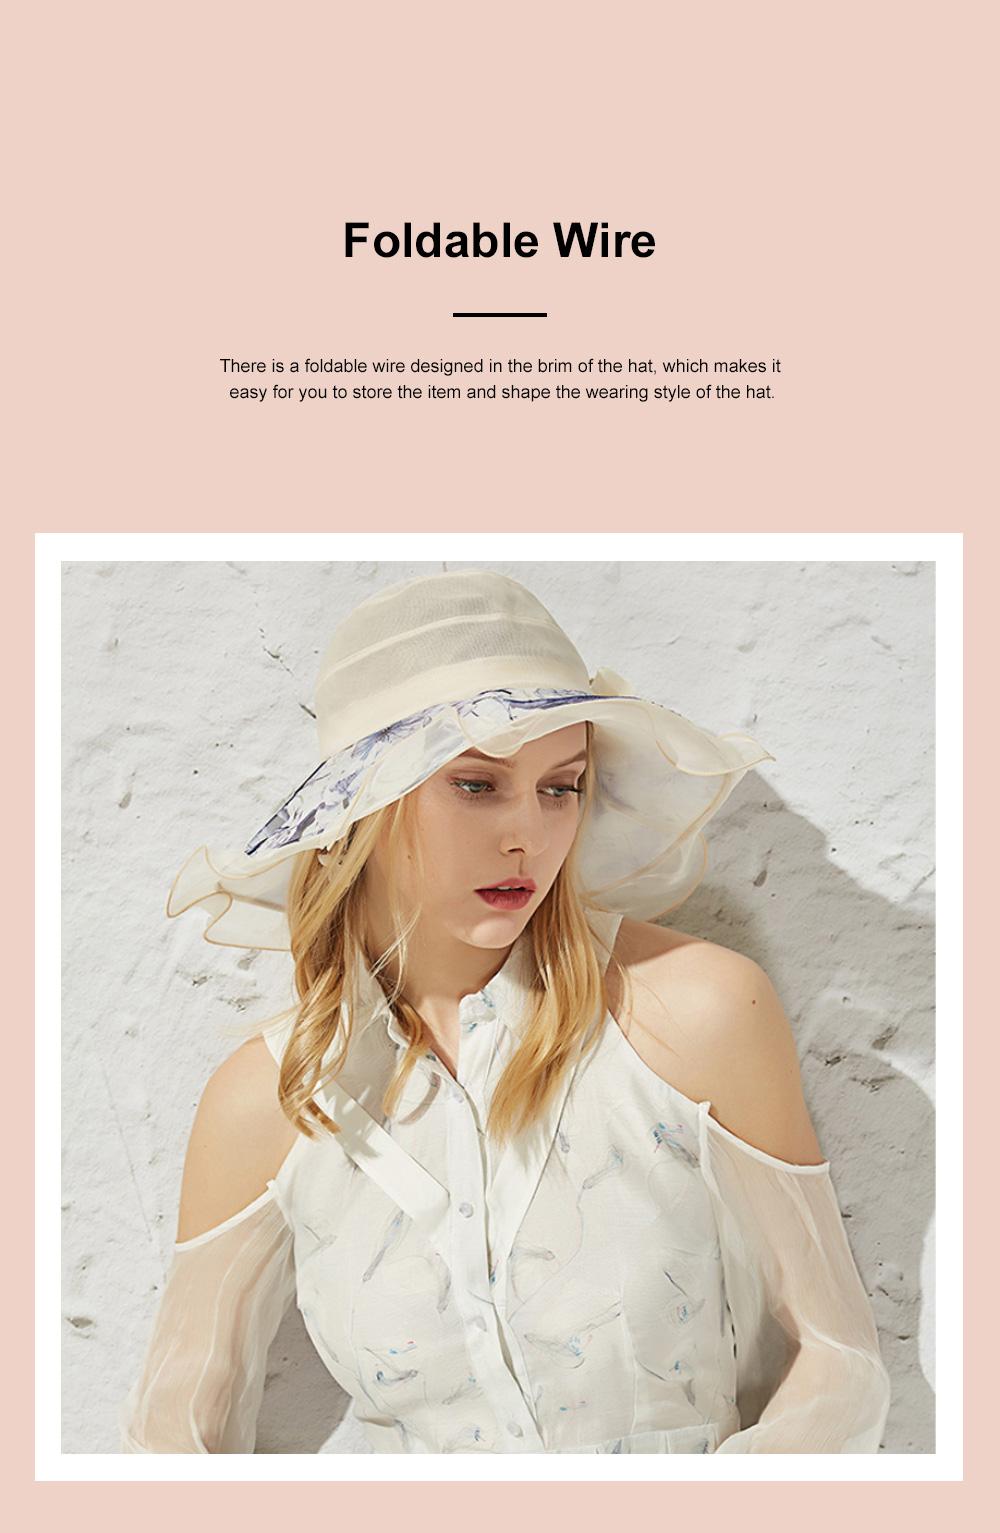 Minimalist Stylish Atmosphere Stereo Flower Model Decorative Foldable Lady Sun Bonnet Hat with Large Brim Wind Rope 2